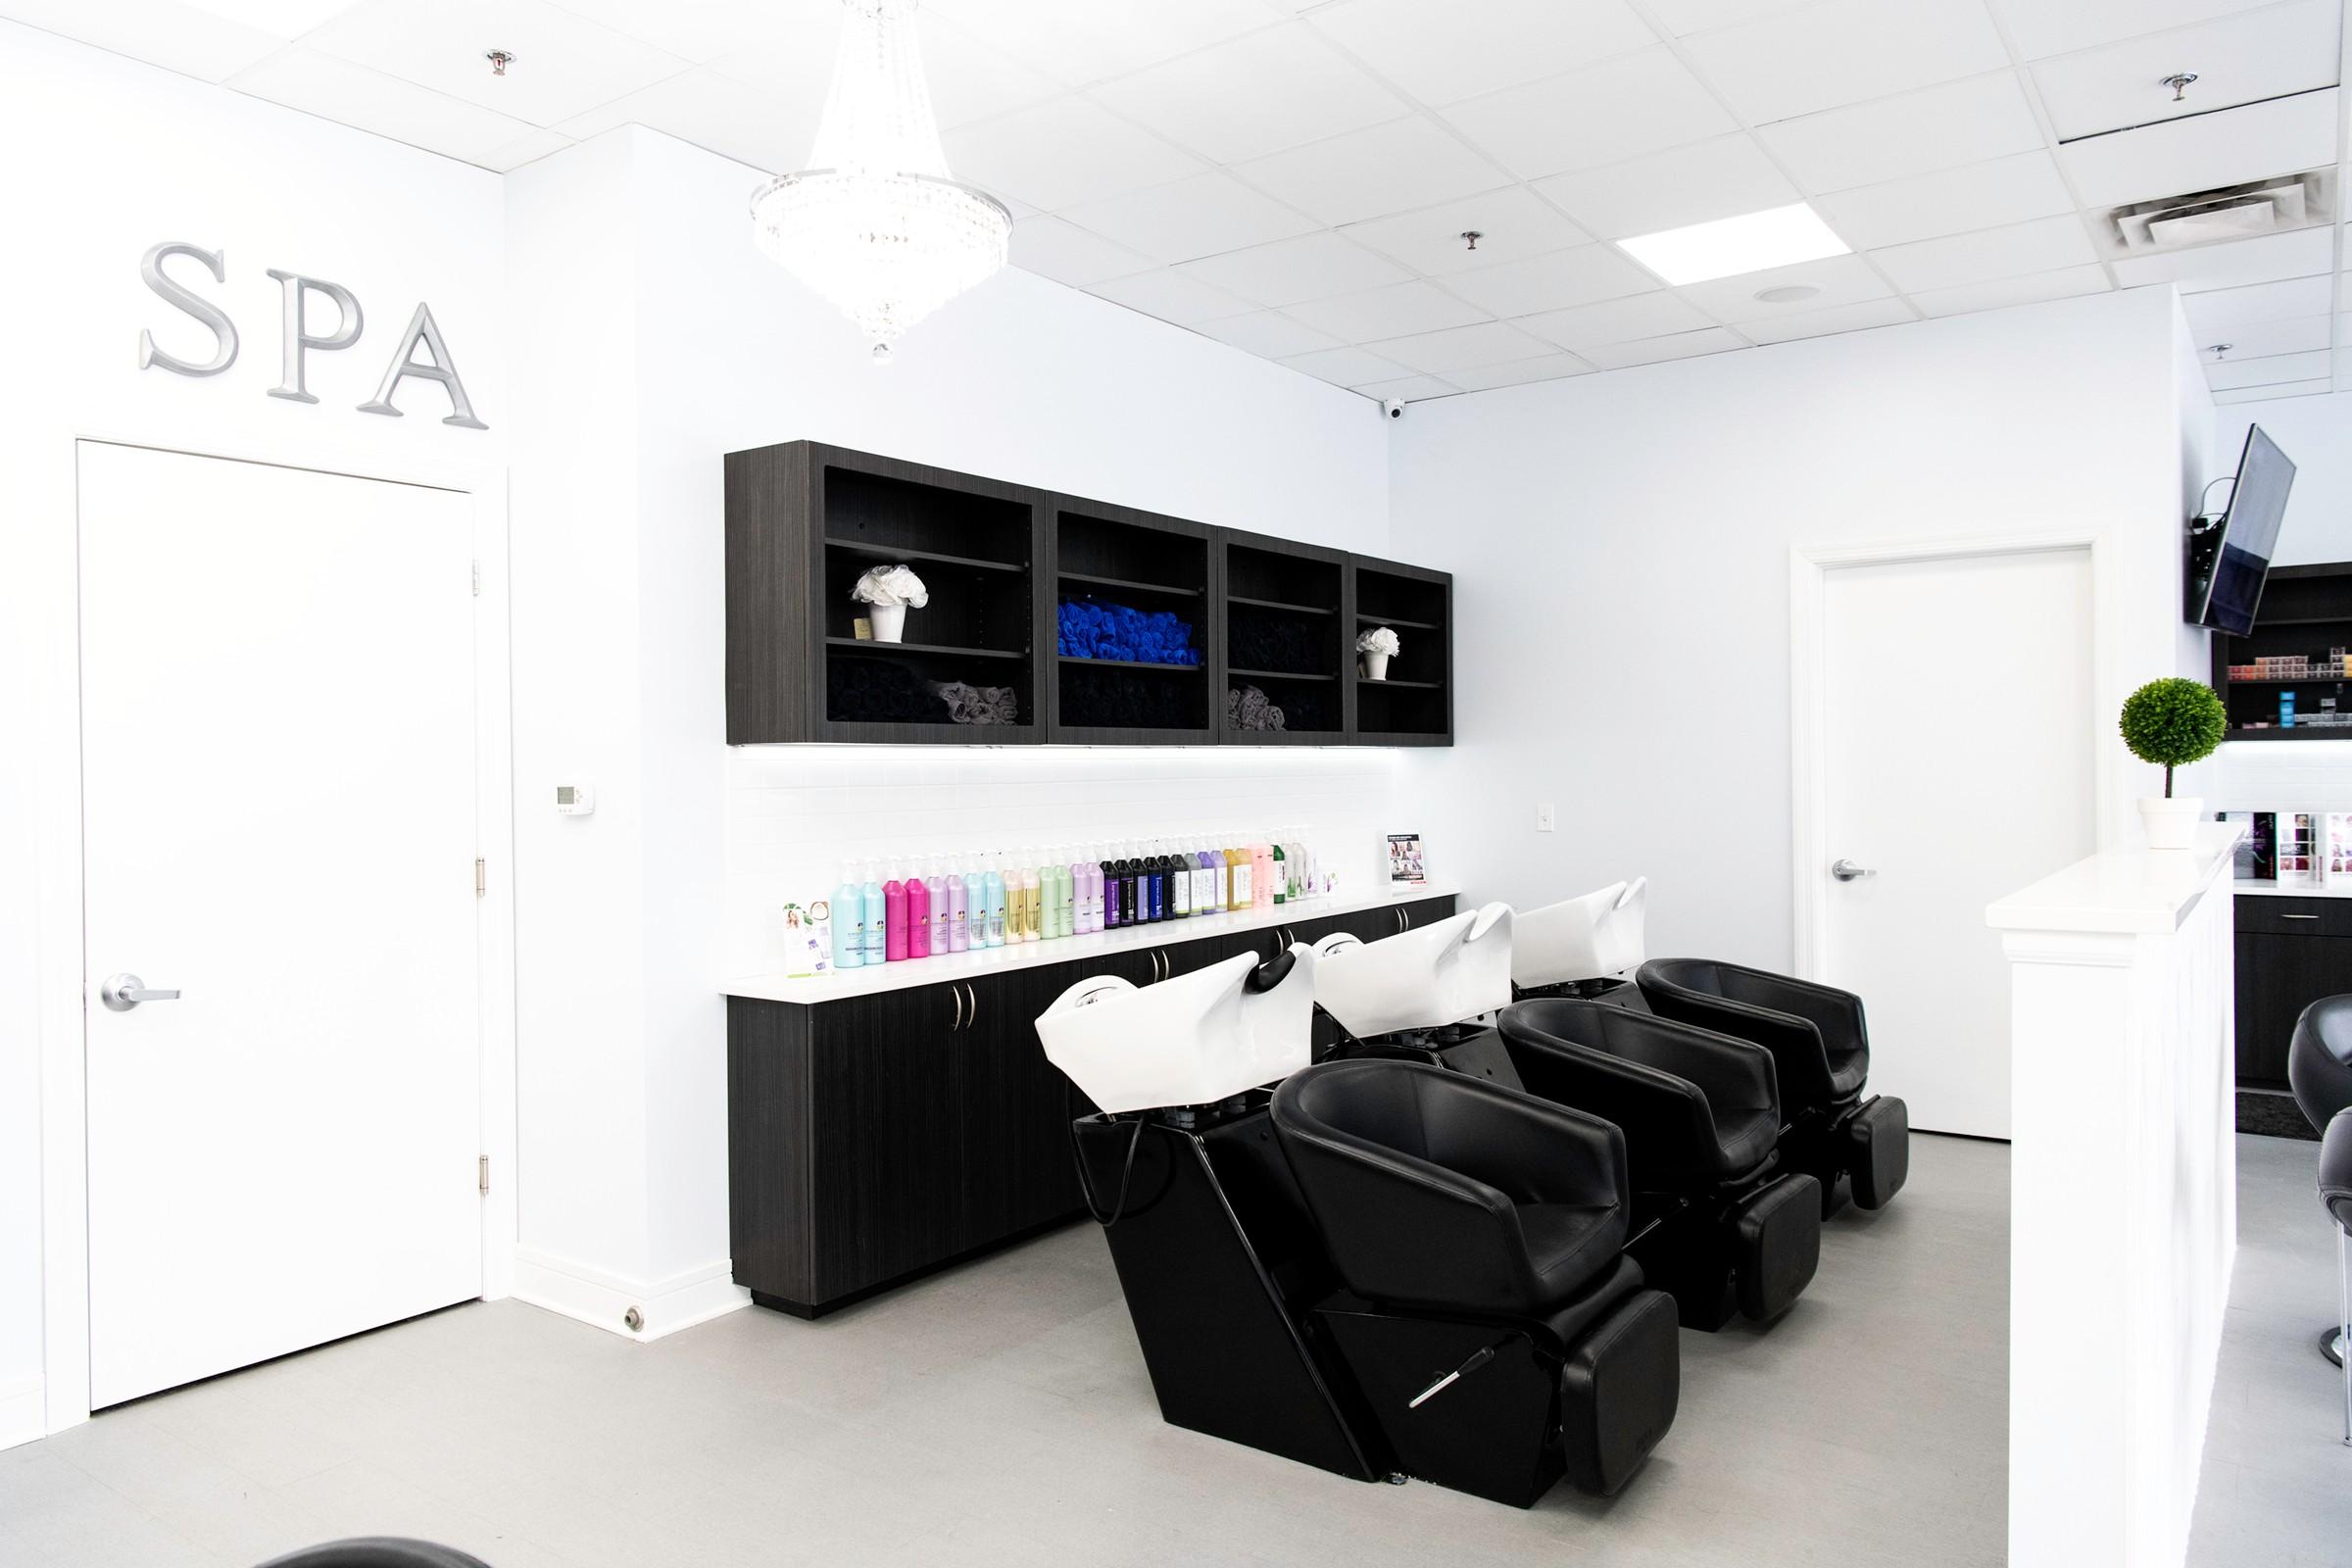 terra northbrook salon hair washing station relax.jpg